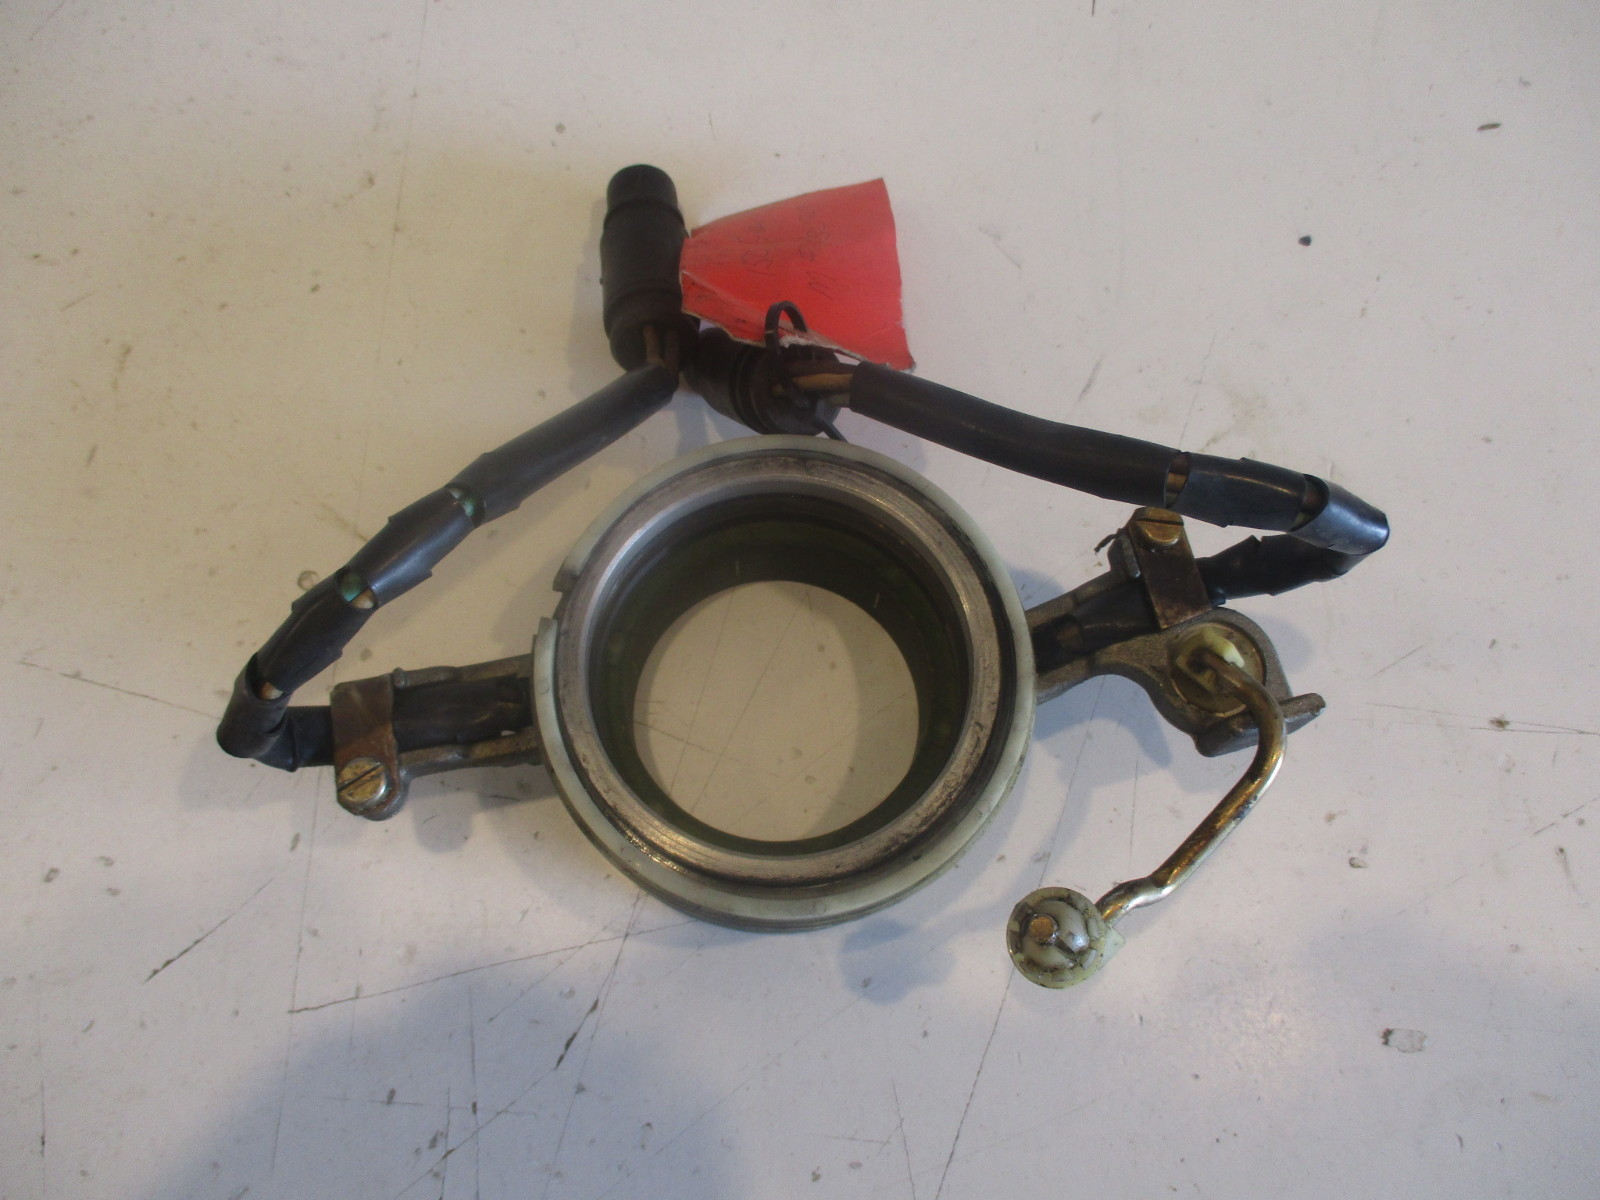 0581985 Johnson Evinrude Trigger Timer Base & Sensor 1979-1980 150-235HP 581985